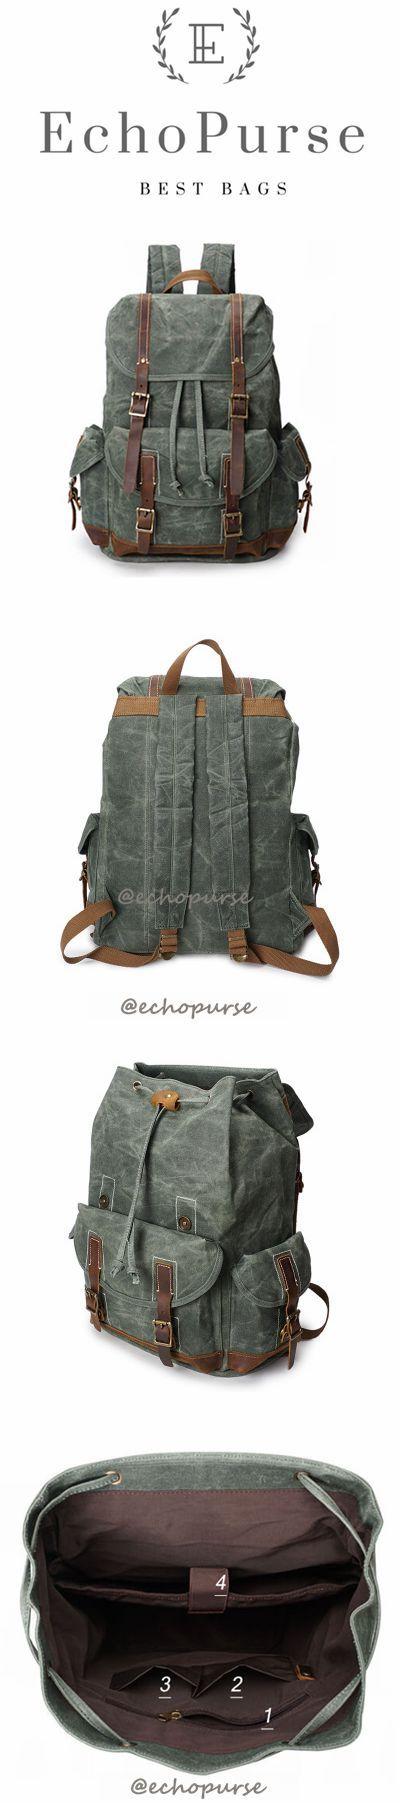 Oil Waxed Canvas Backpack, Vintage Waterproof Sports Backpack, Cyan Travel Backpack YD256